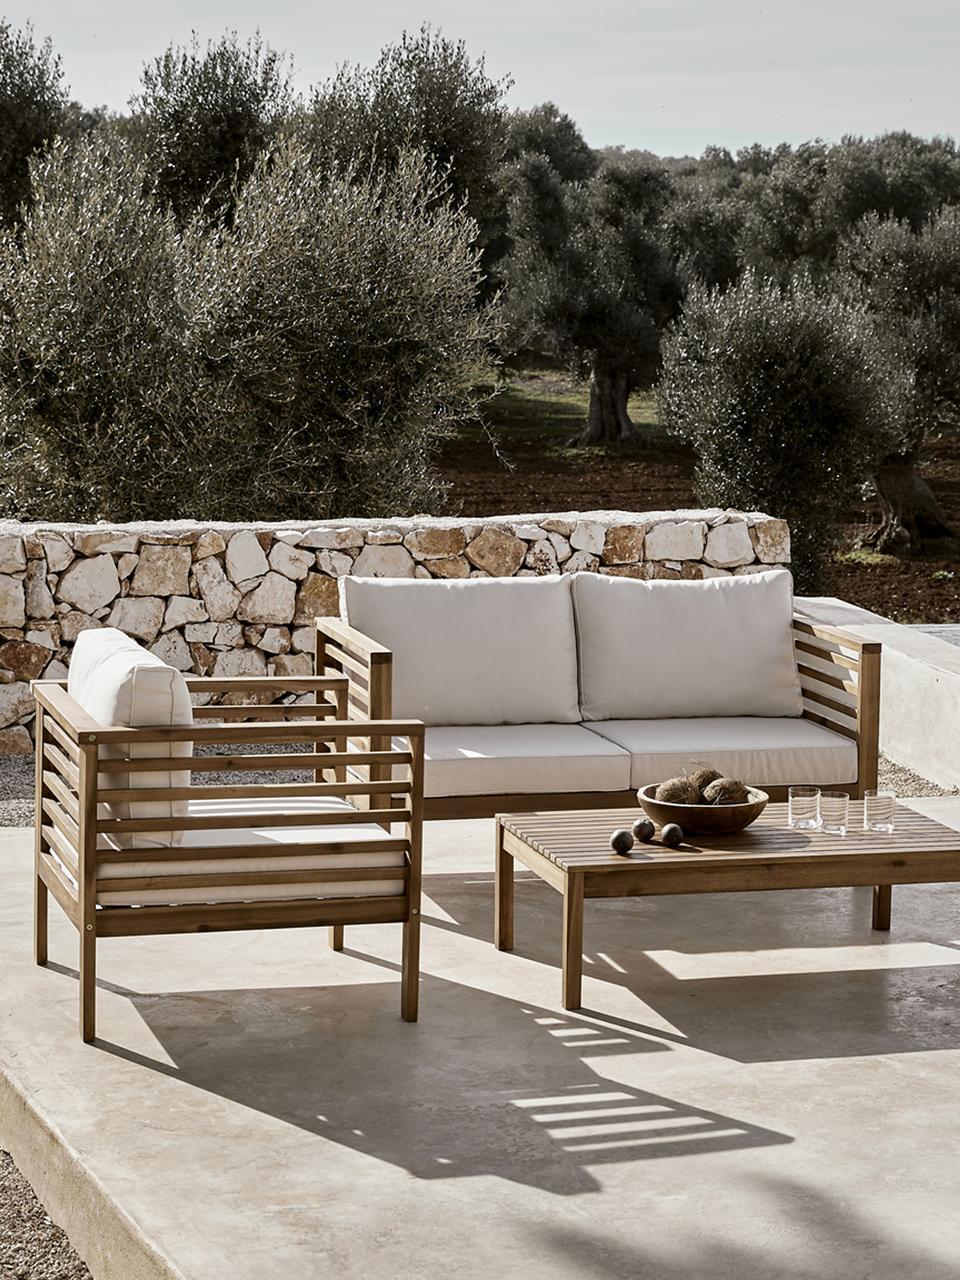 Outdoor loungeset Bo, 4-delig, Frame: massief geolied acaciahou, Bekleding: beige. Frame: acaciahoutkleurig, Set met verschillende formaten